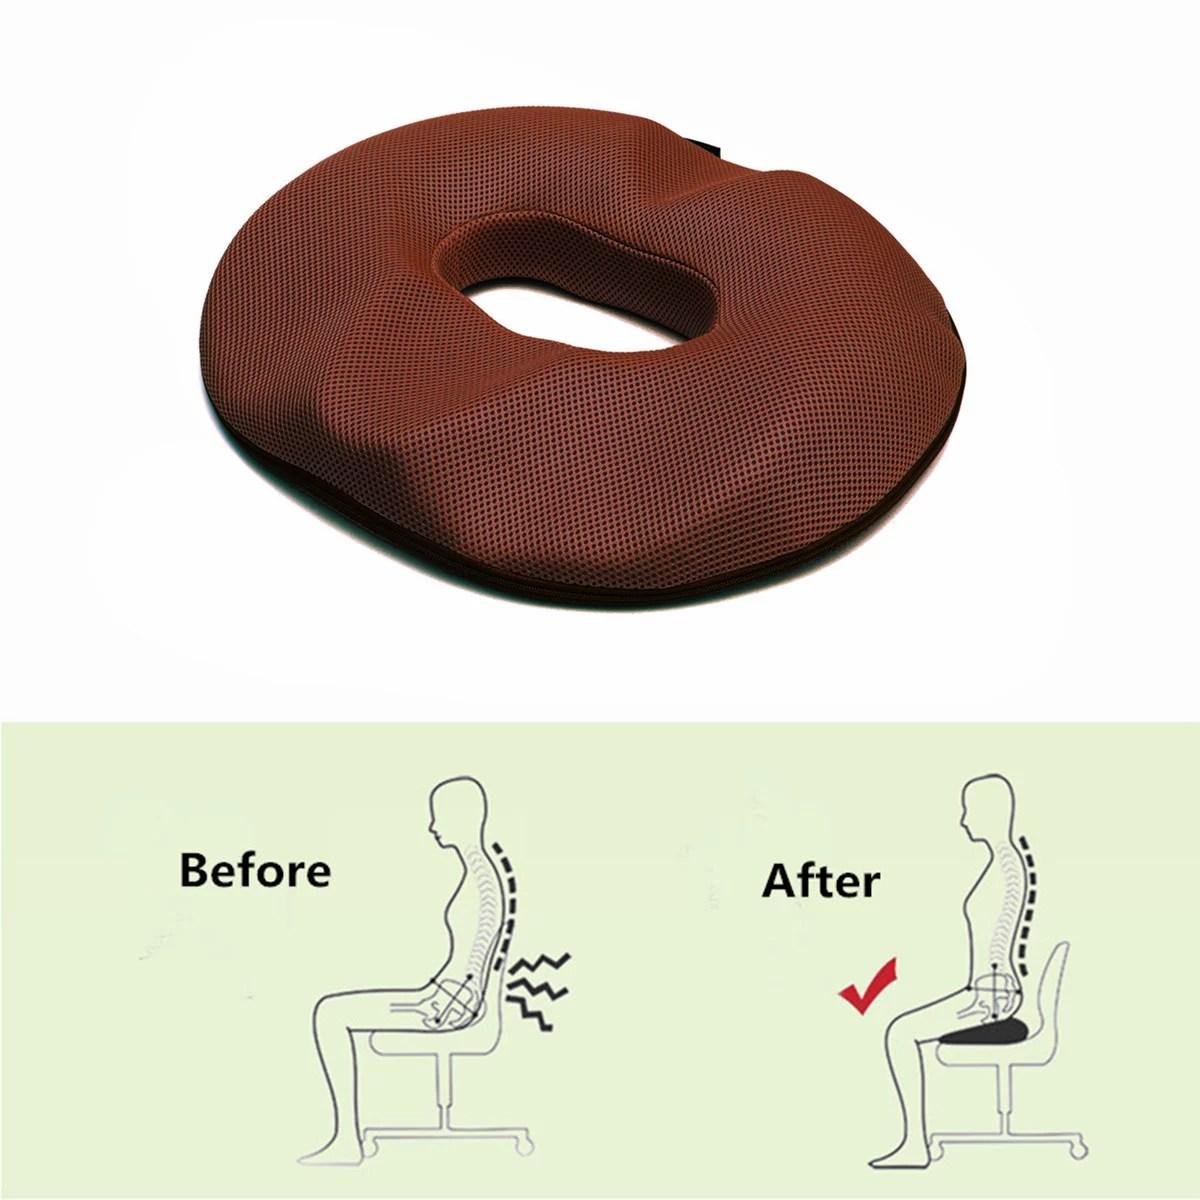 men hemorrhoid treatment donut tailbone cushion prostate pillow pregnancy post natal bed sores coccyx sciatica 18 inches premium comfort memory